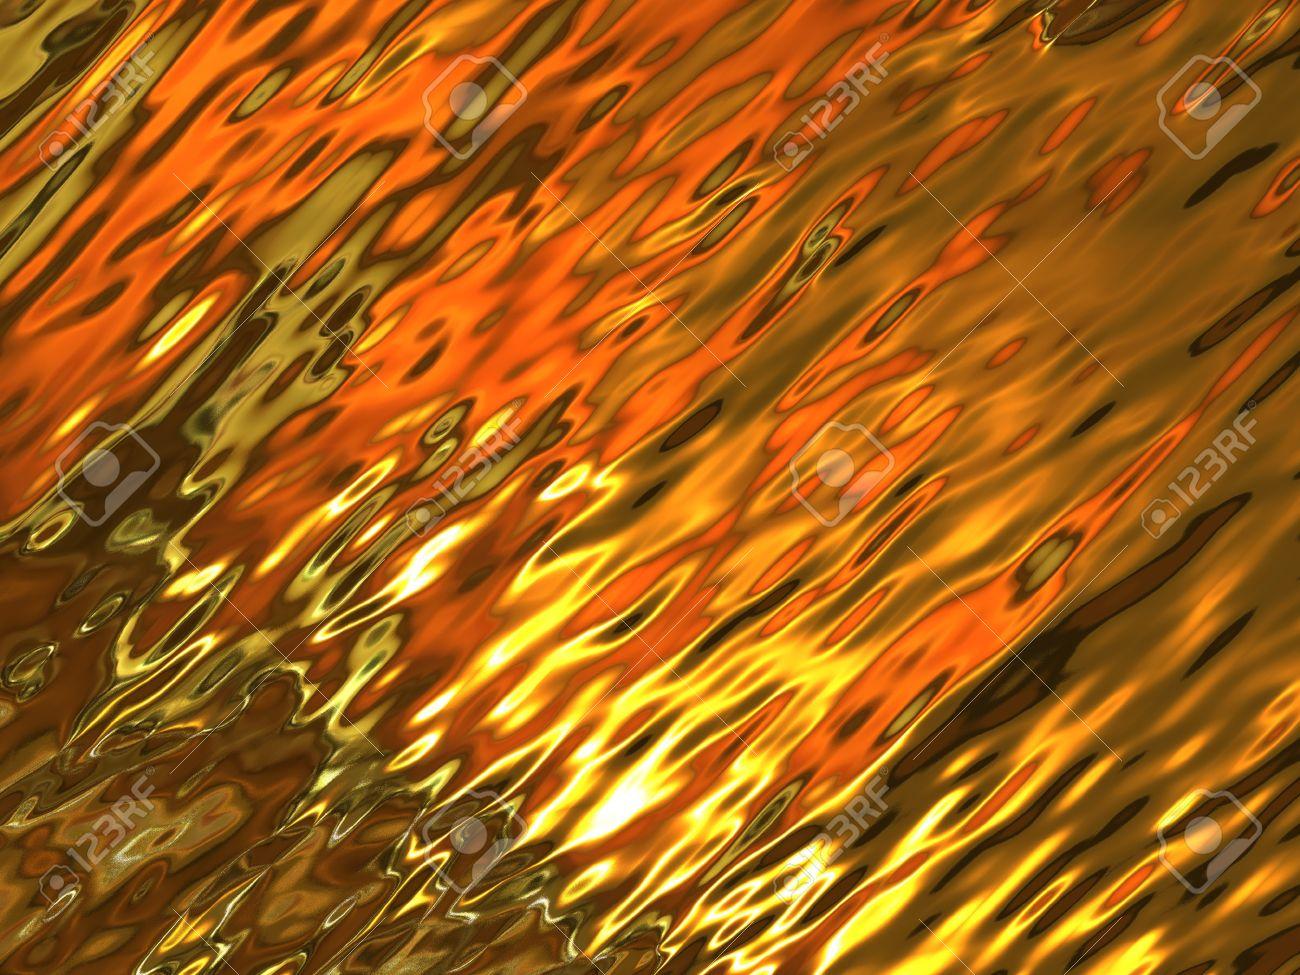 Tough Teaching [Vaurien] - Página 3 7568064-Gold-fire-texture-Stock-Photo